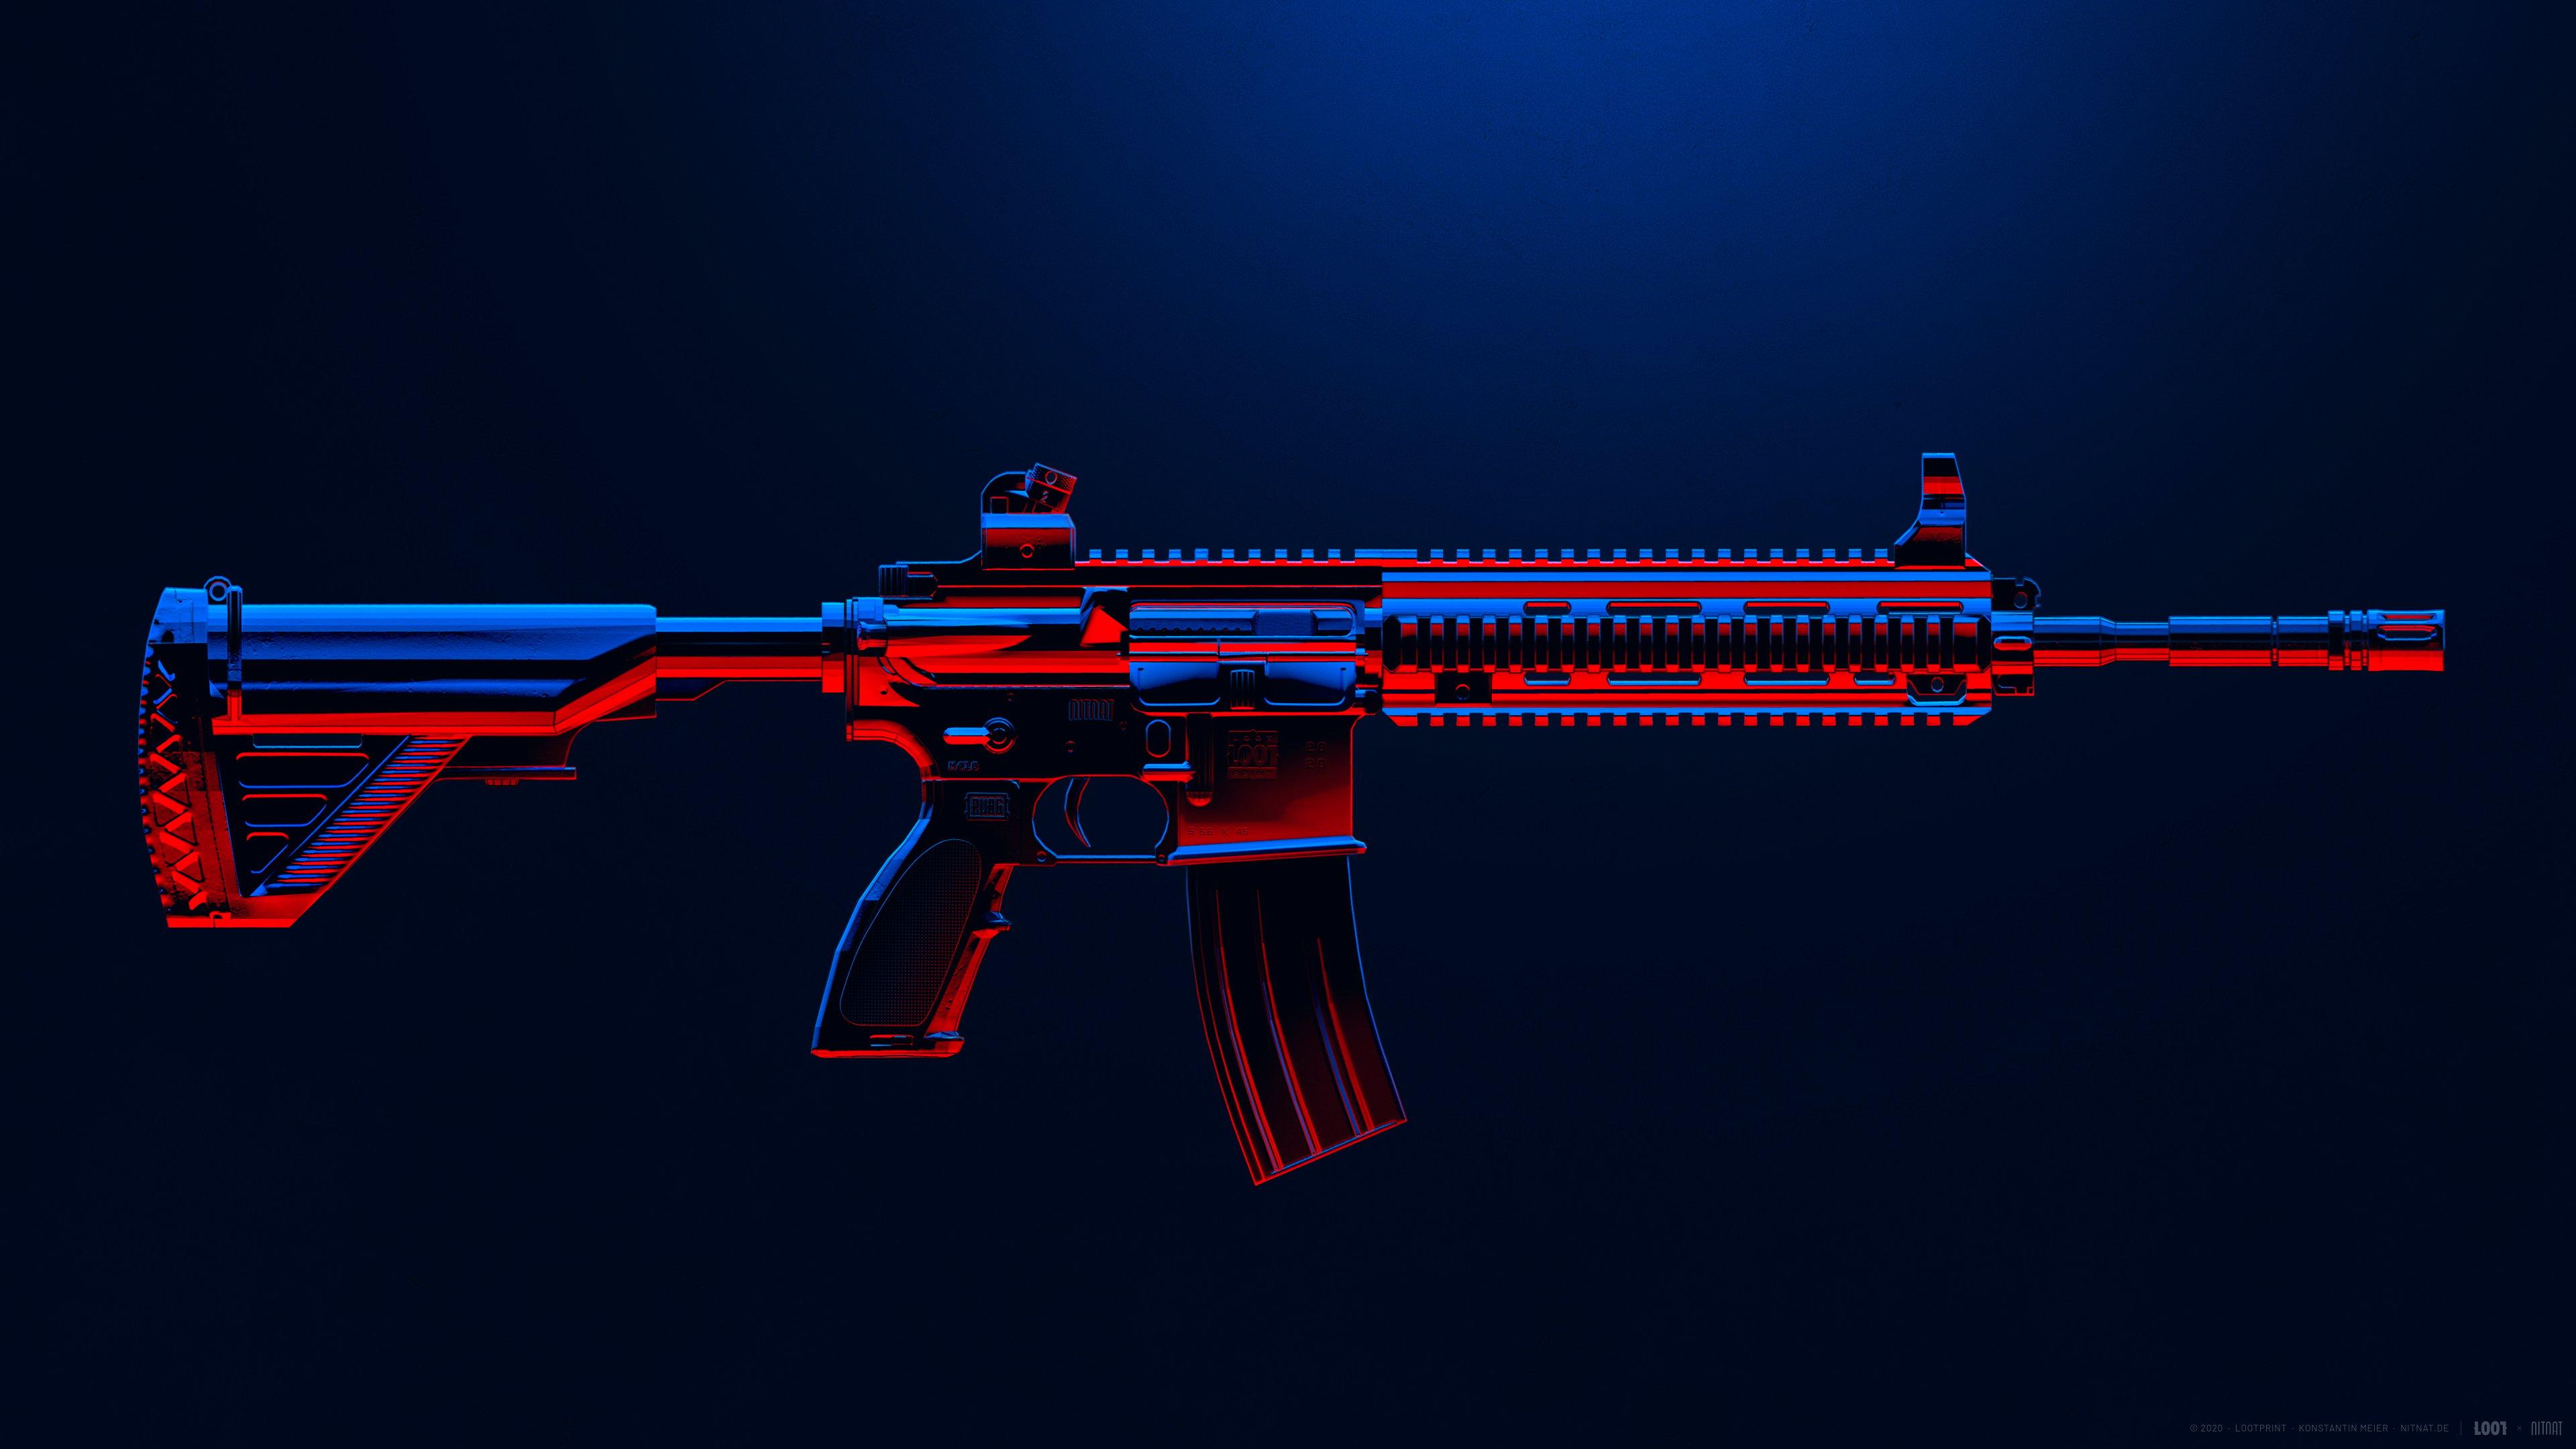 Fondos de pantalla Arma M416 de PUBG